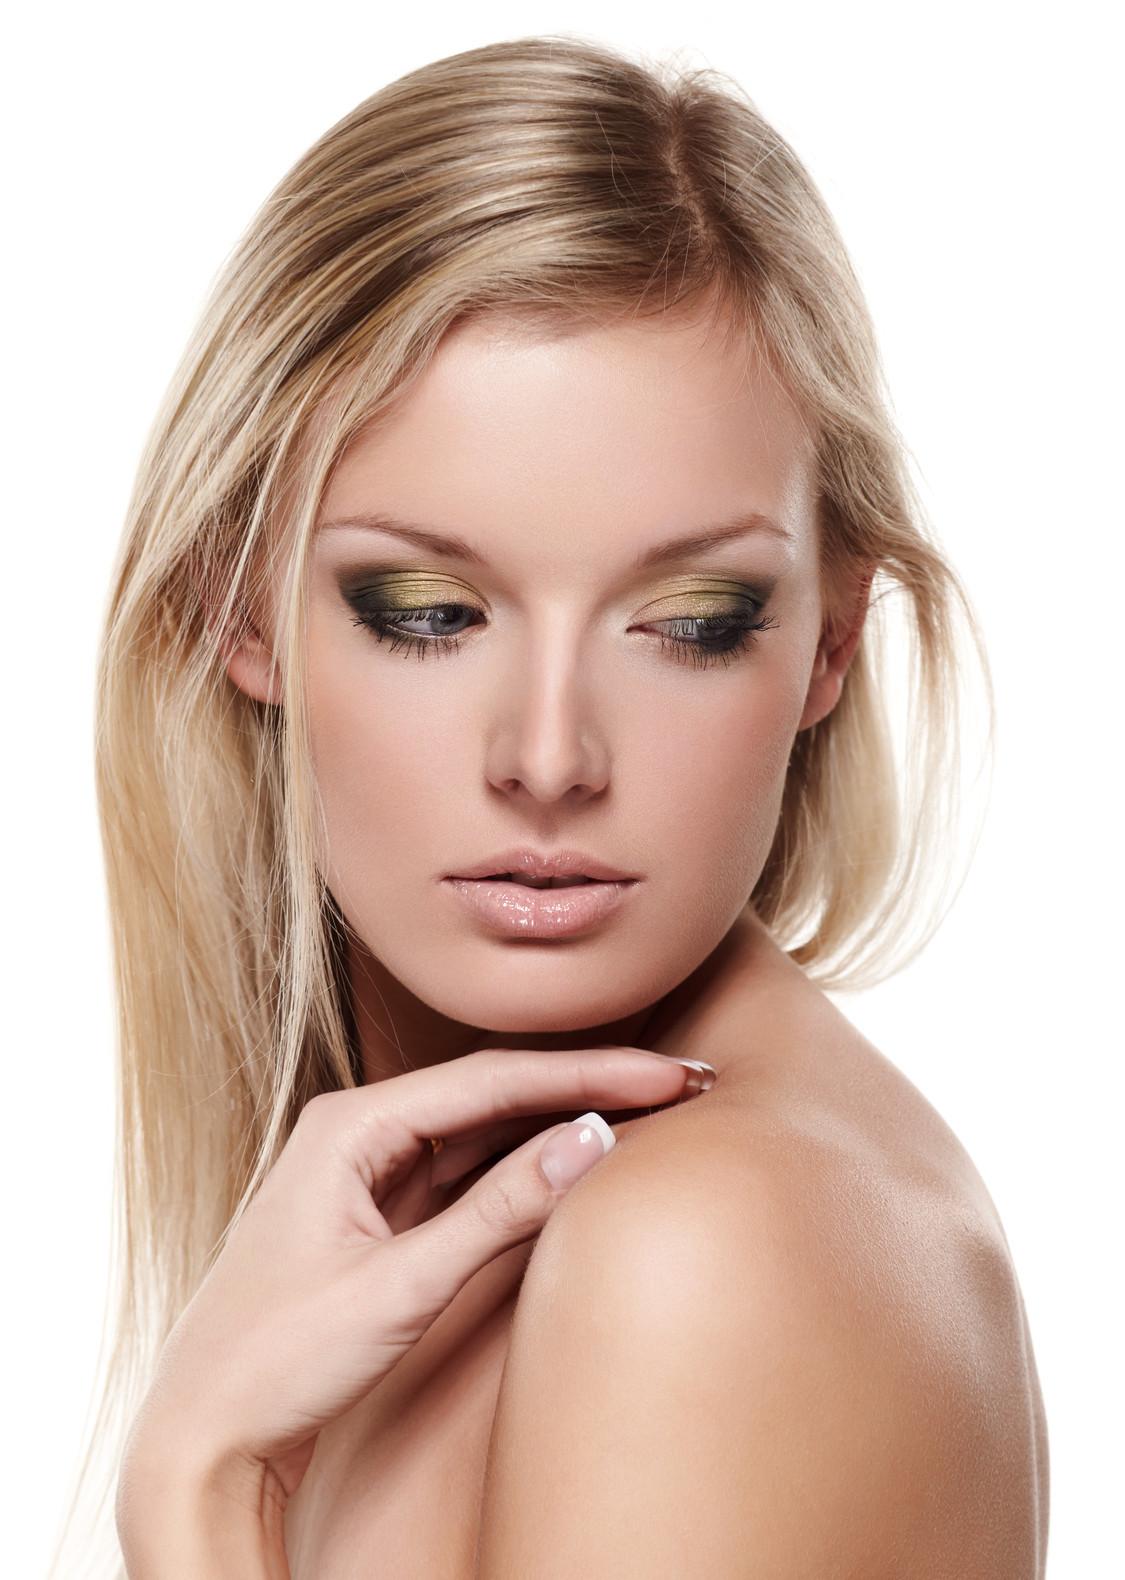 Kosmetiksalon Hurtenbach